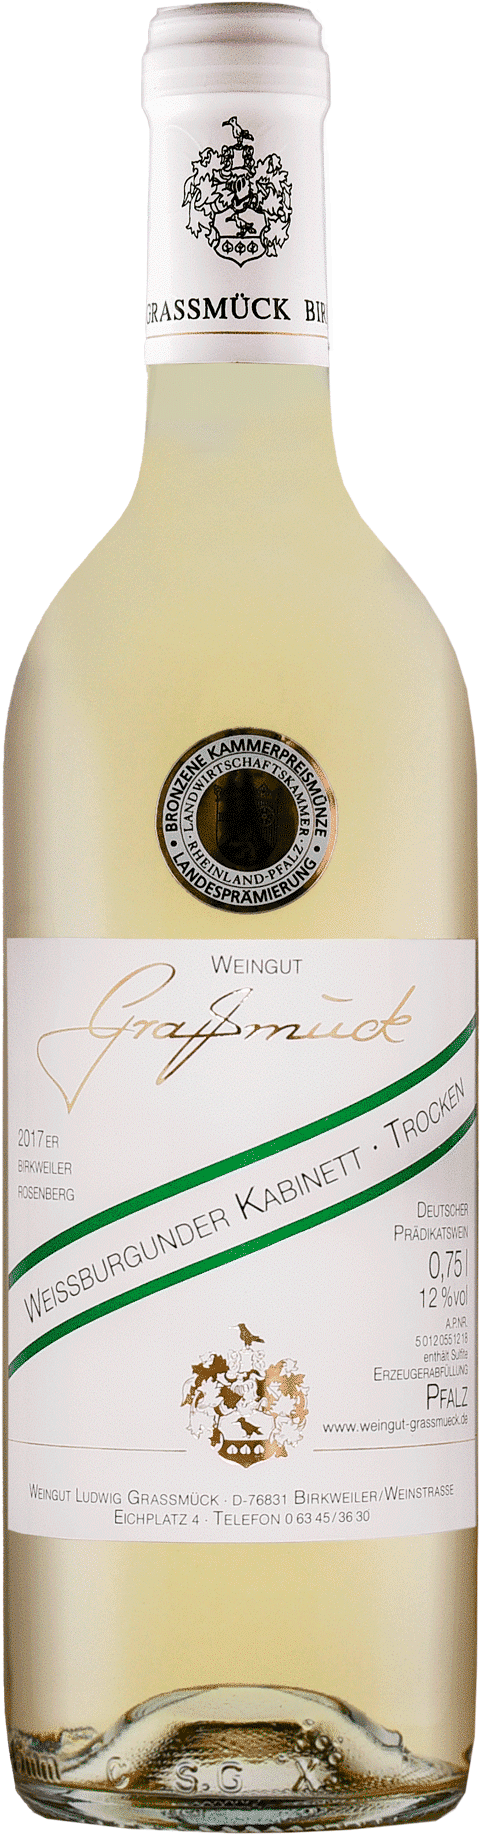 Weingut Ludwig Graßmück, Simon Graßmück, Weissburgunder Kabinett, trocken